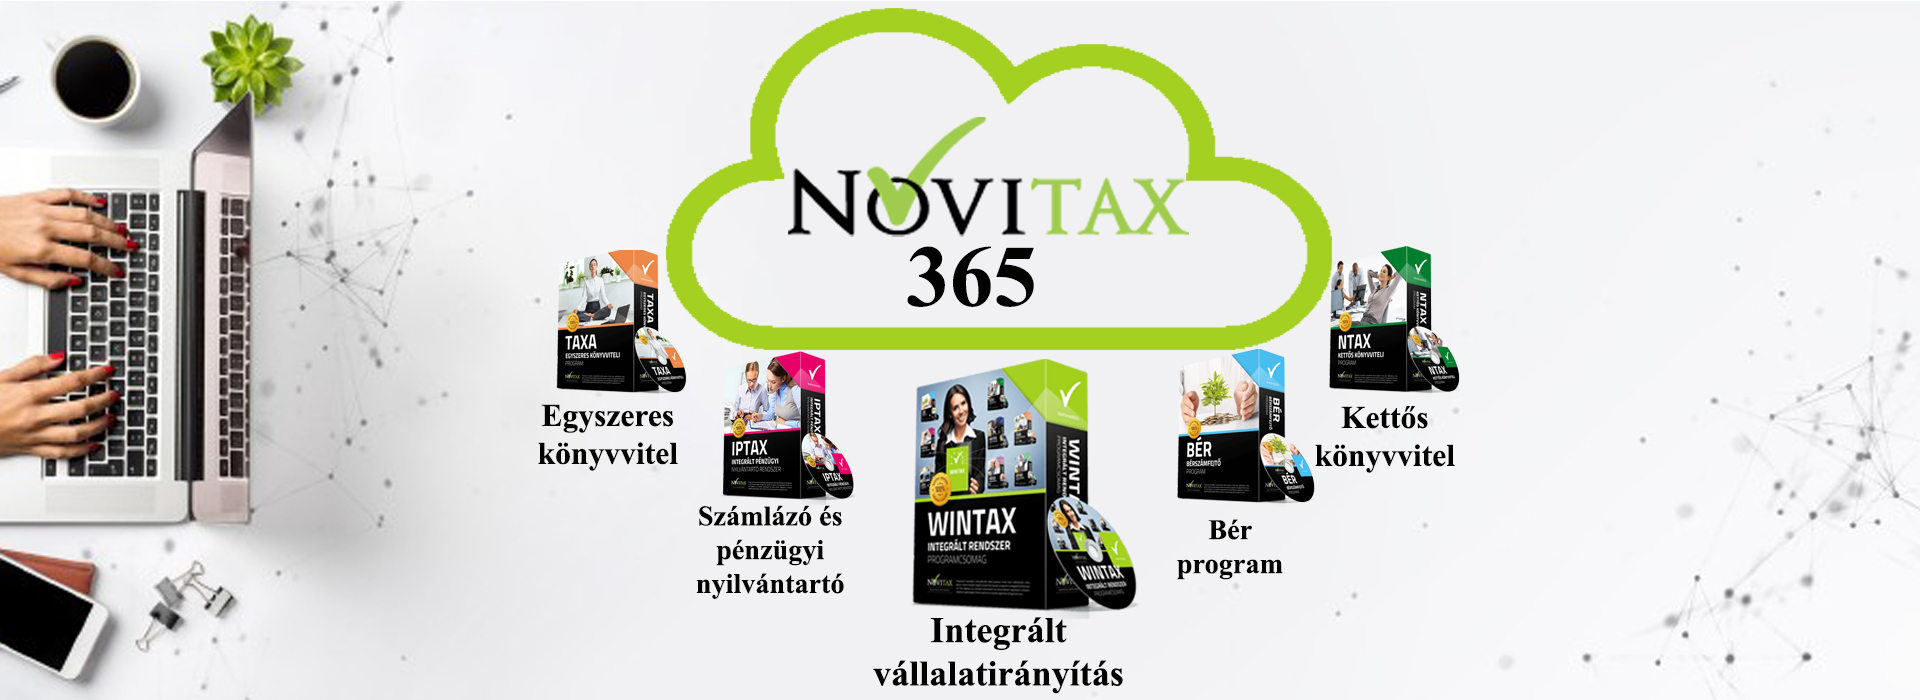 Novitax 365